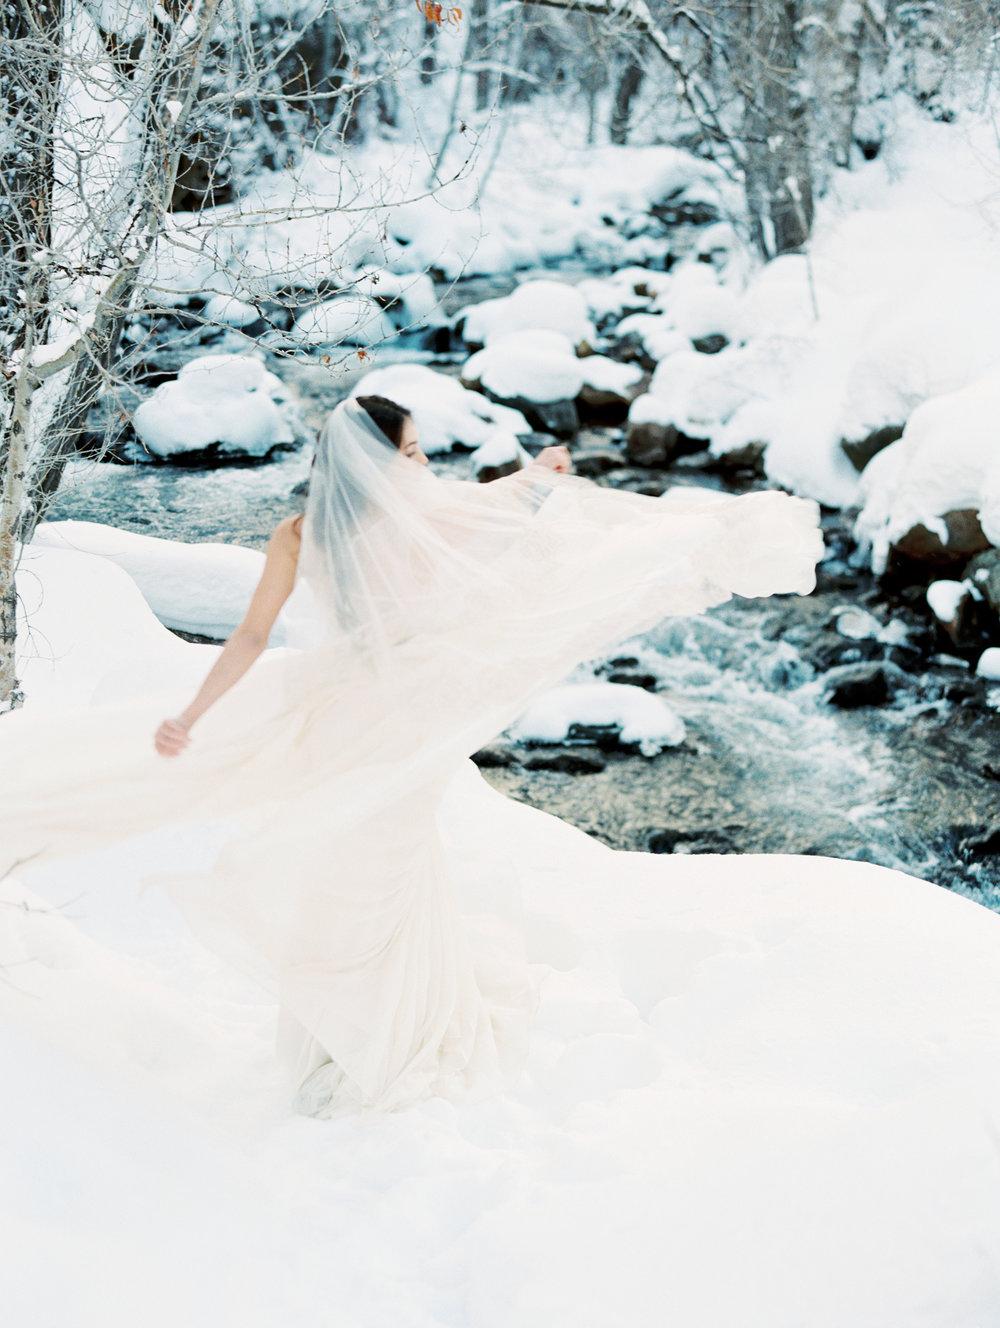 BellaCosa_WinterWonderland-106.jpg